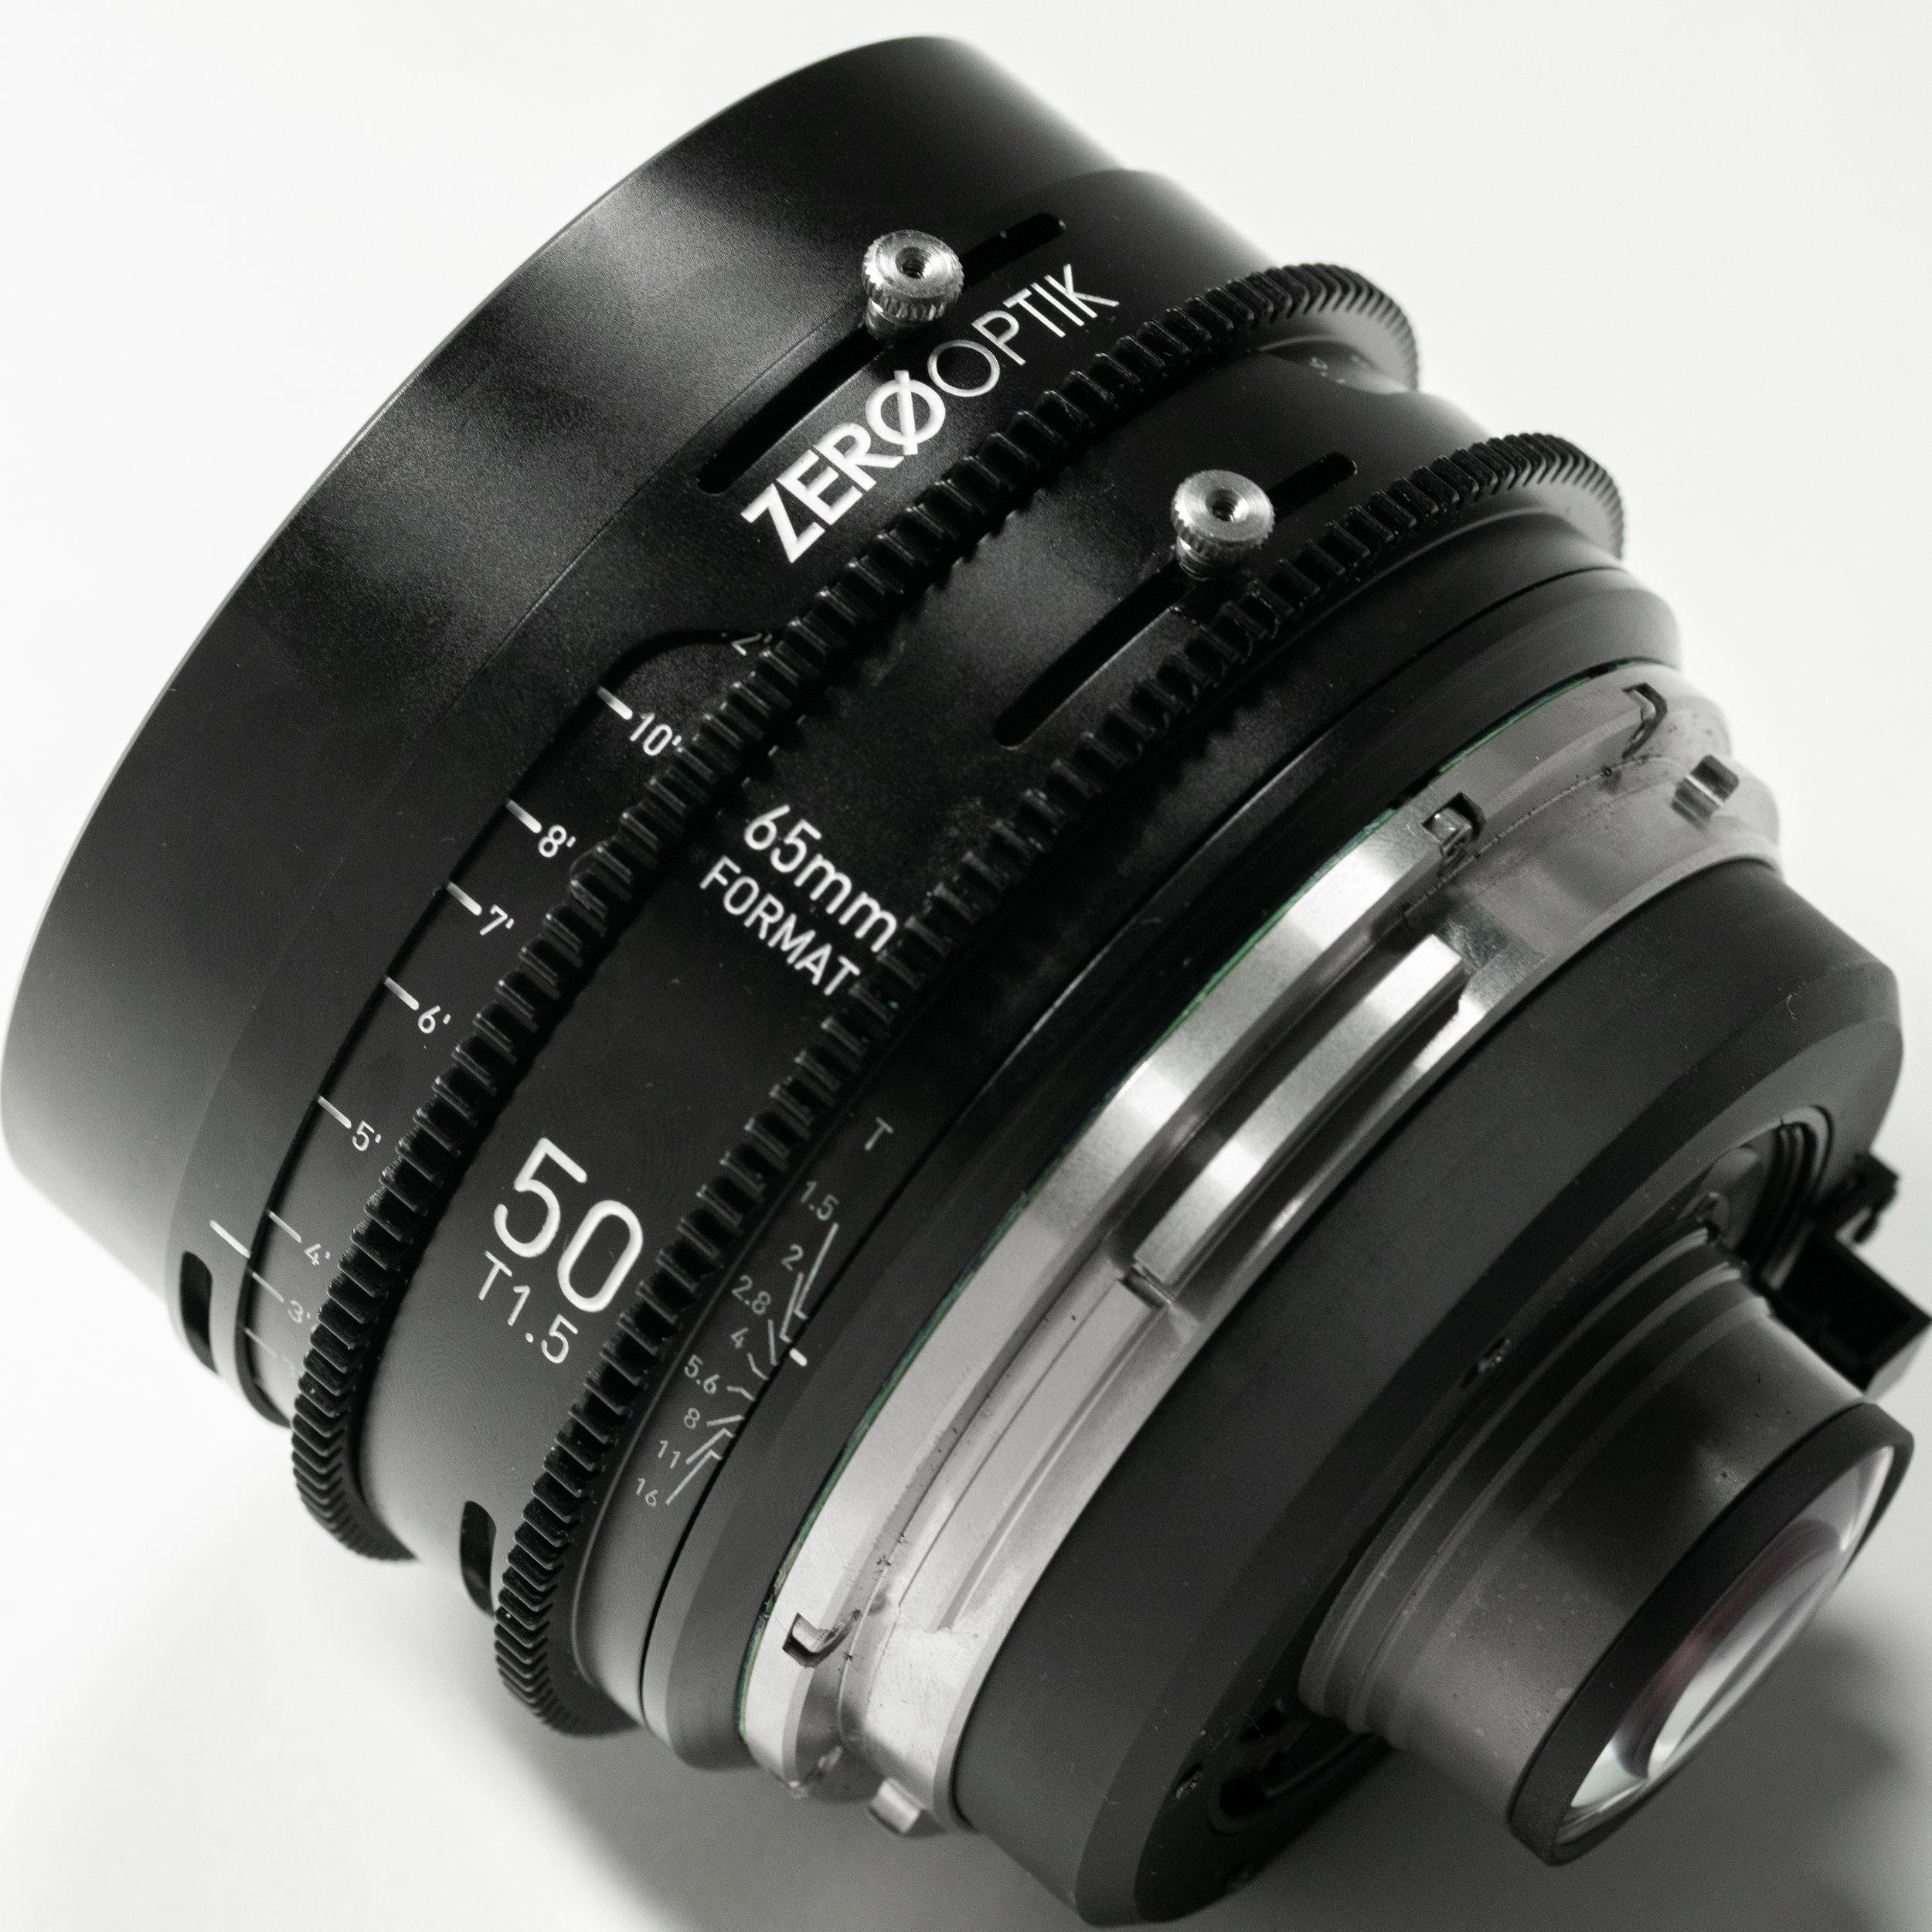 DSC08245-2.jpg